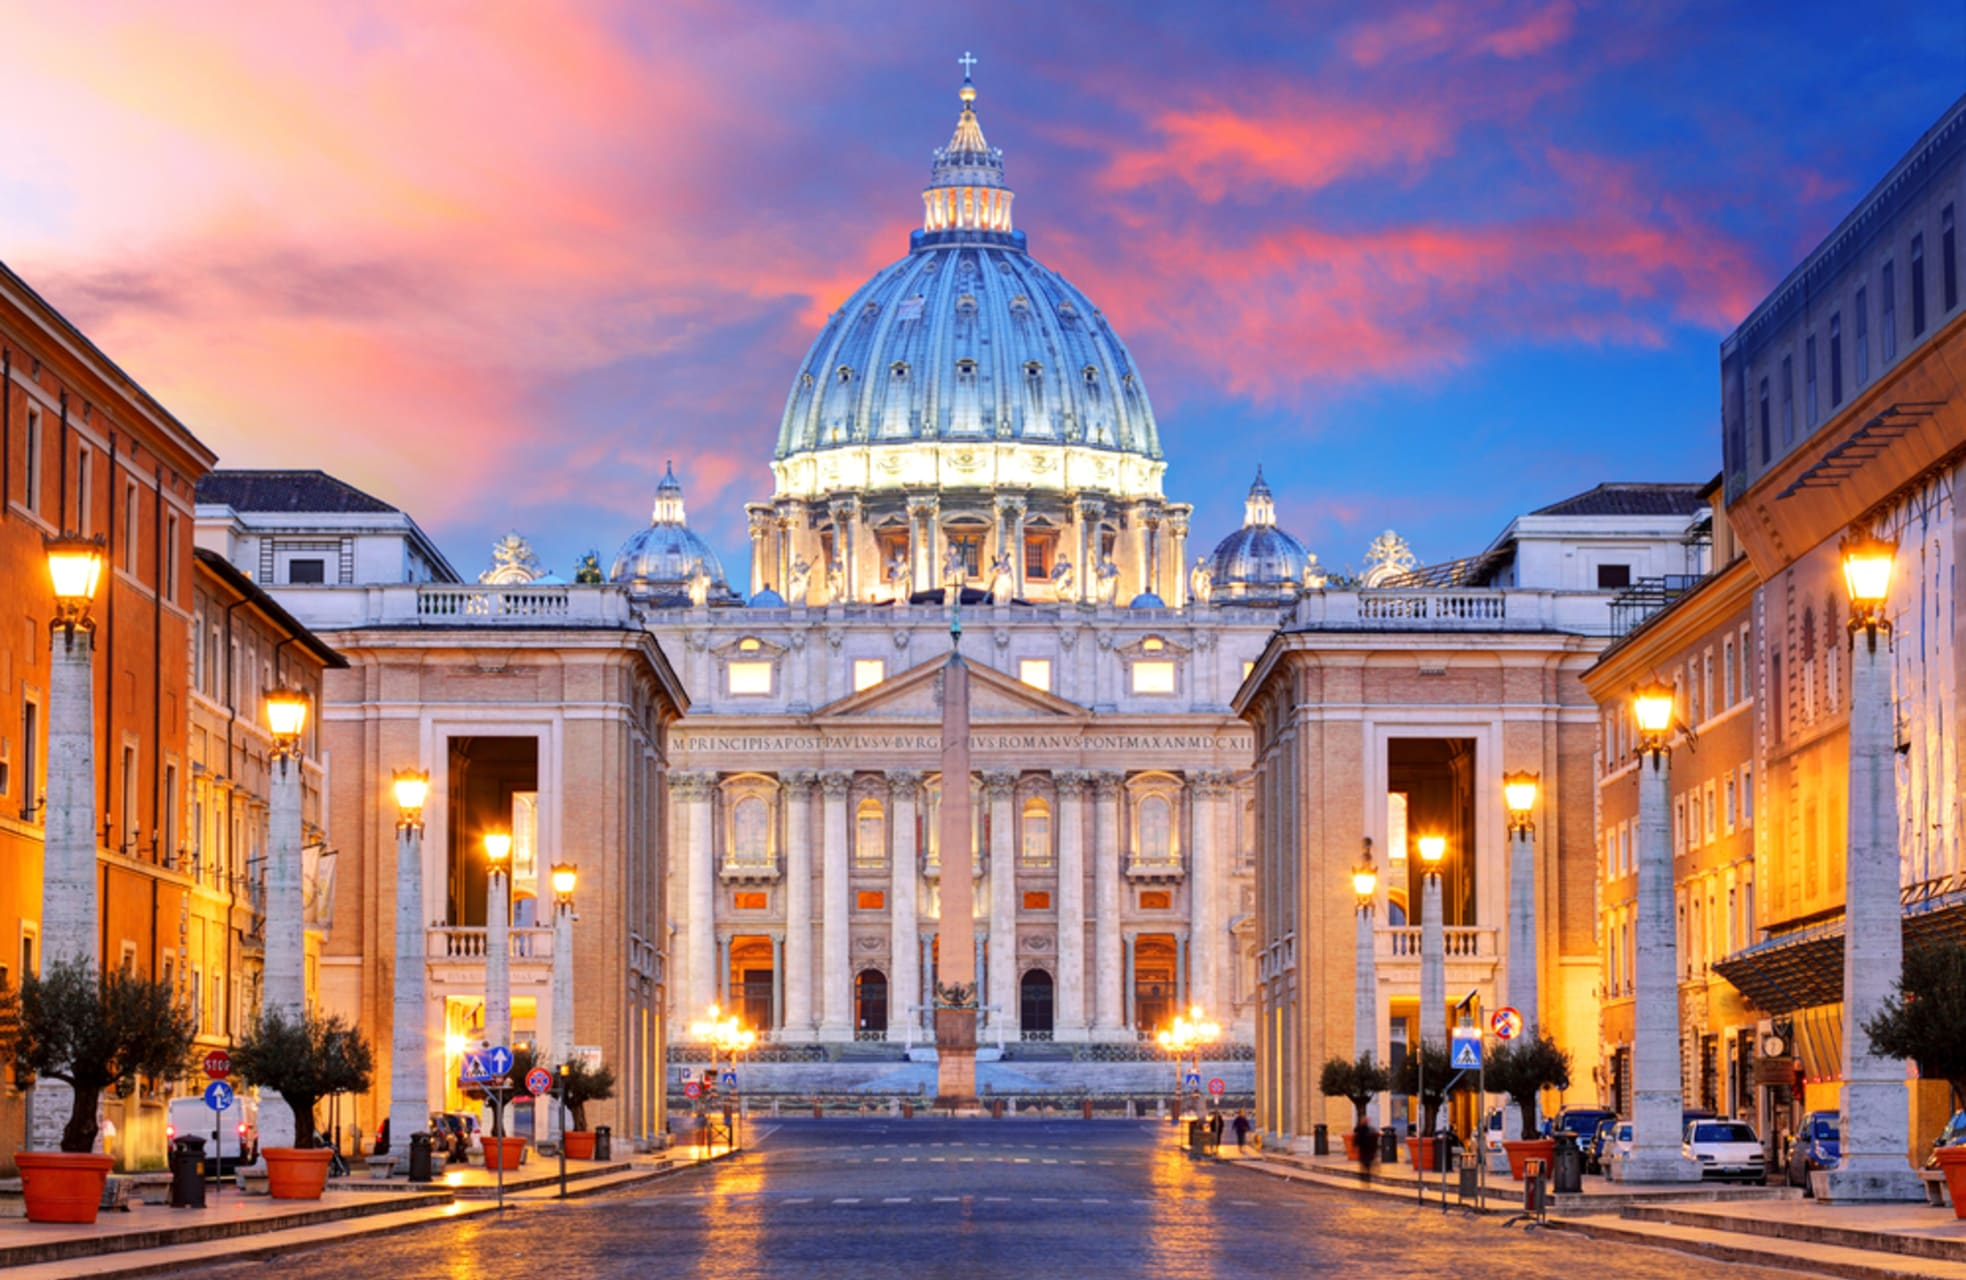 Rome - Castel Sant'Angelo to Saint Peter's Basilica